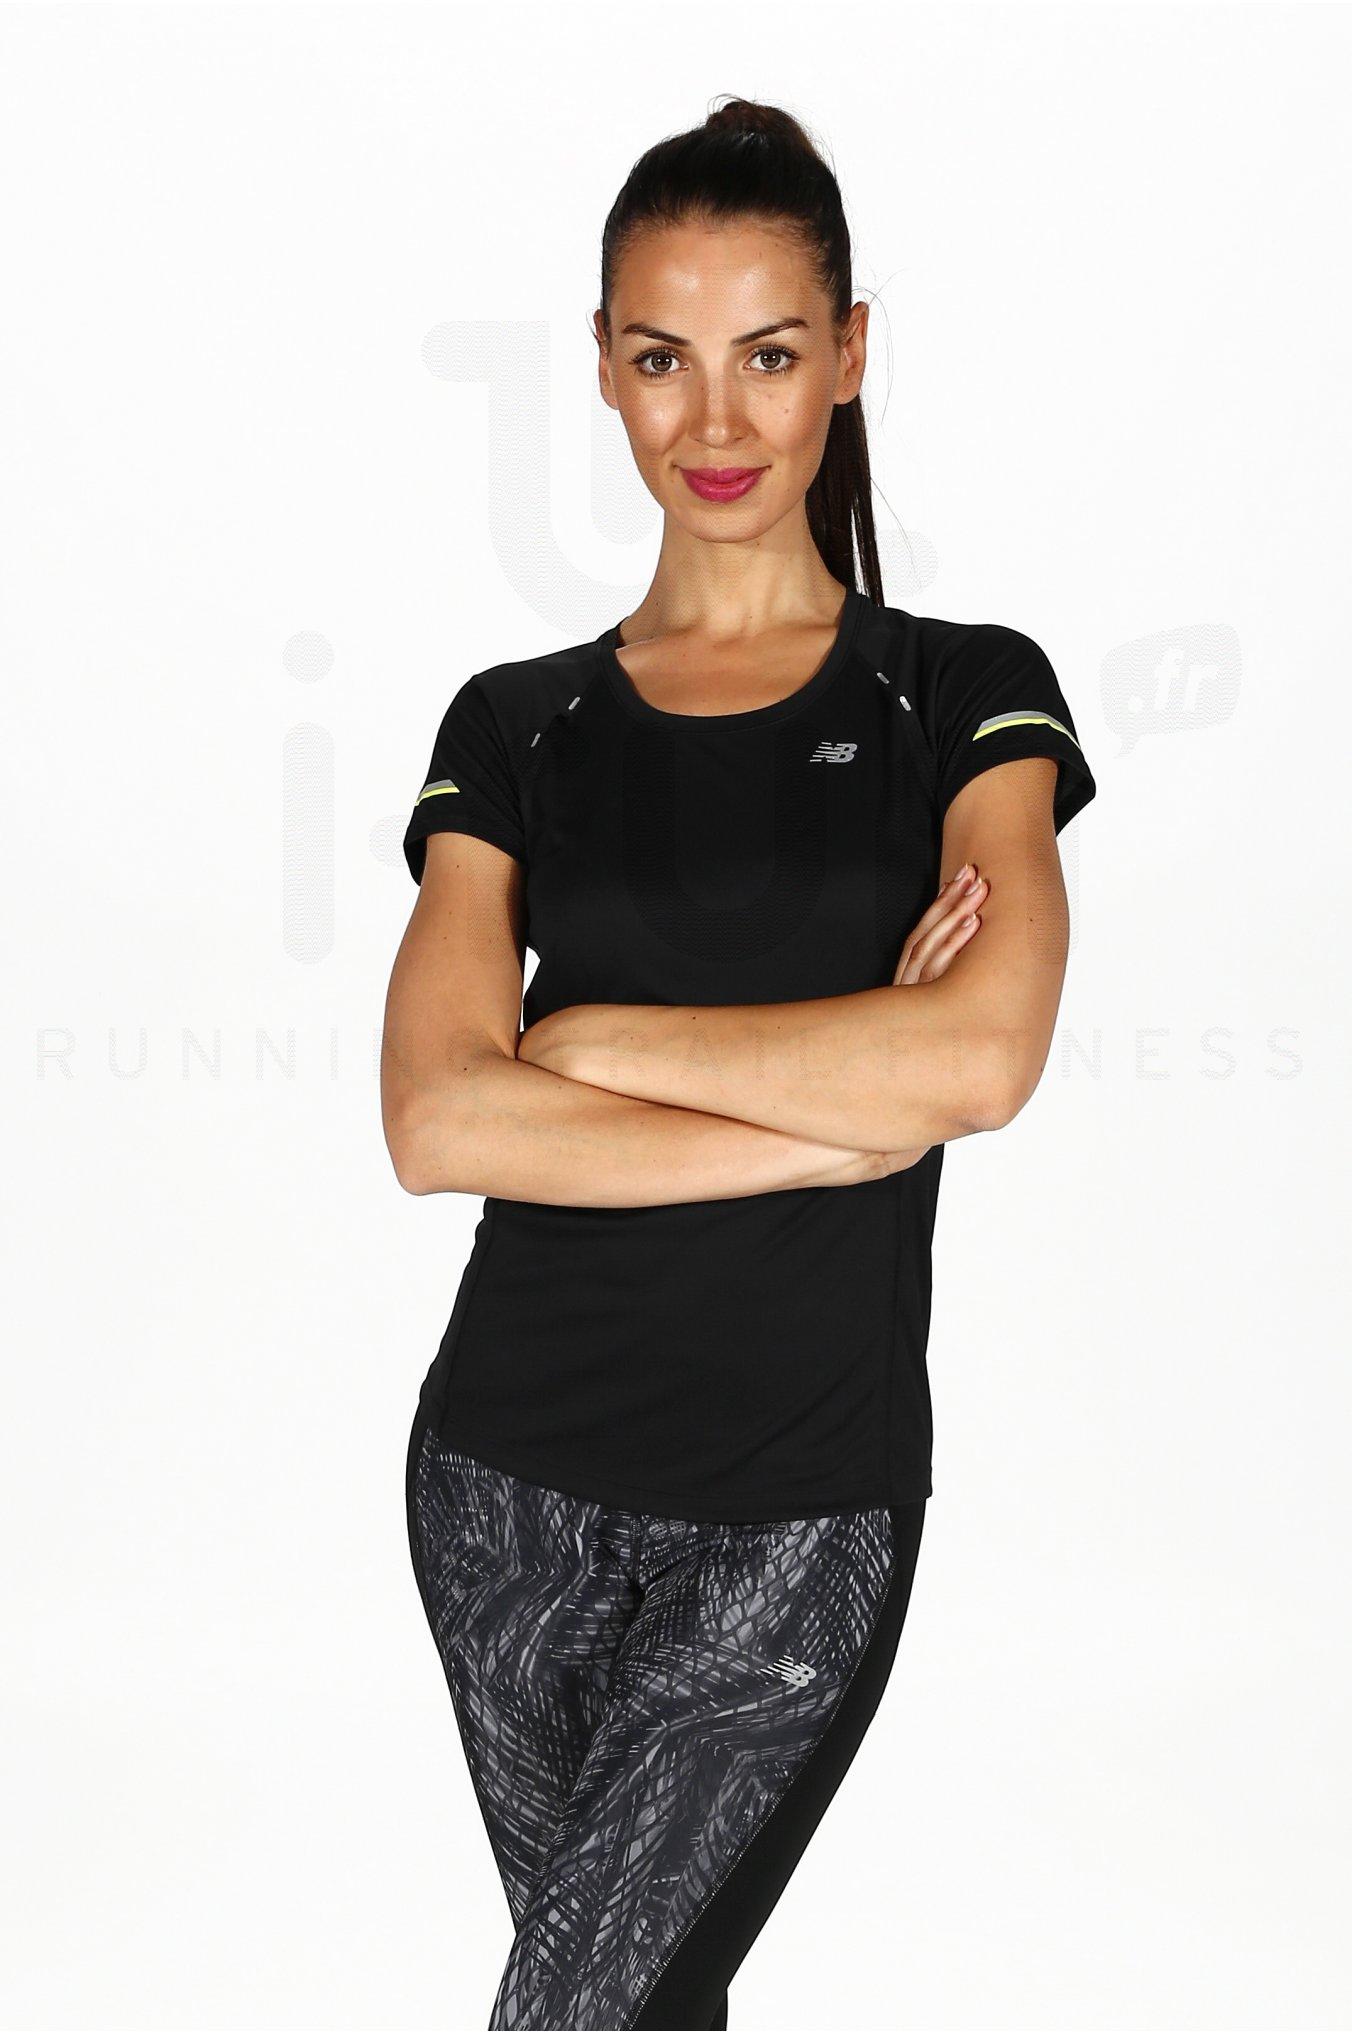 Ice Femme Bonjour Tee Shirt W Balance Vetements 1 162654 New Ftpz b6gvfyIY7m